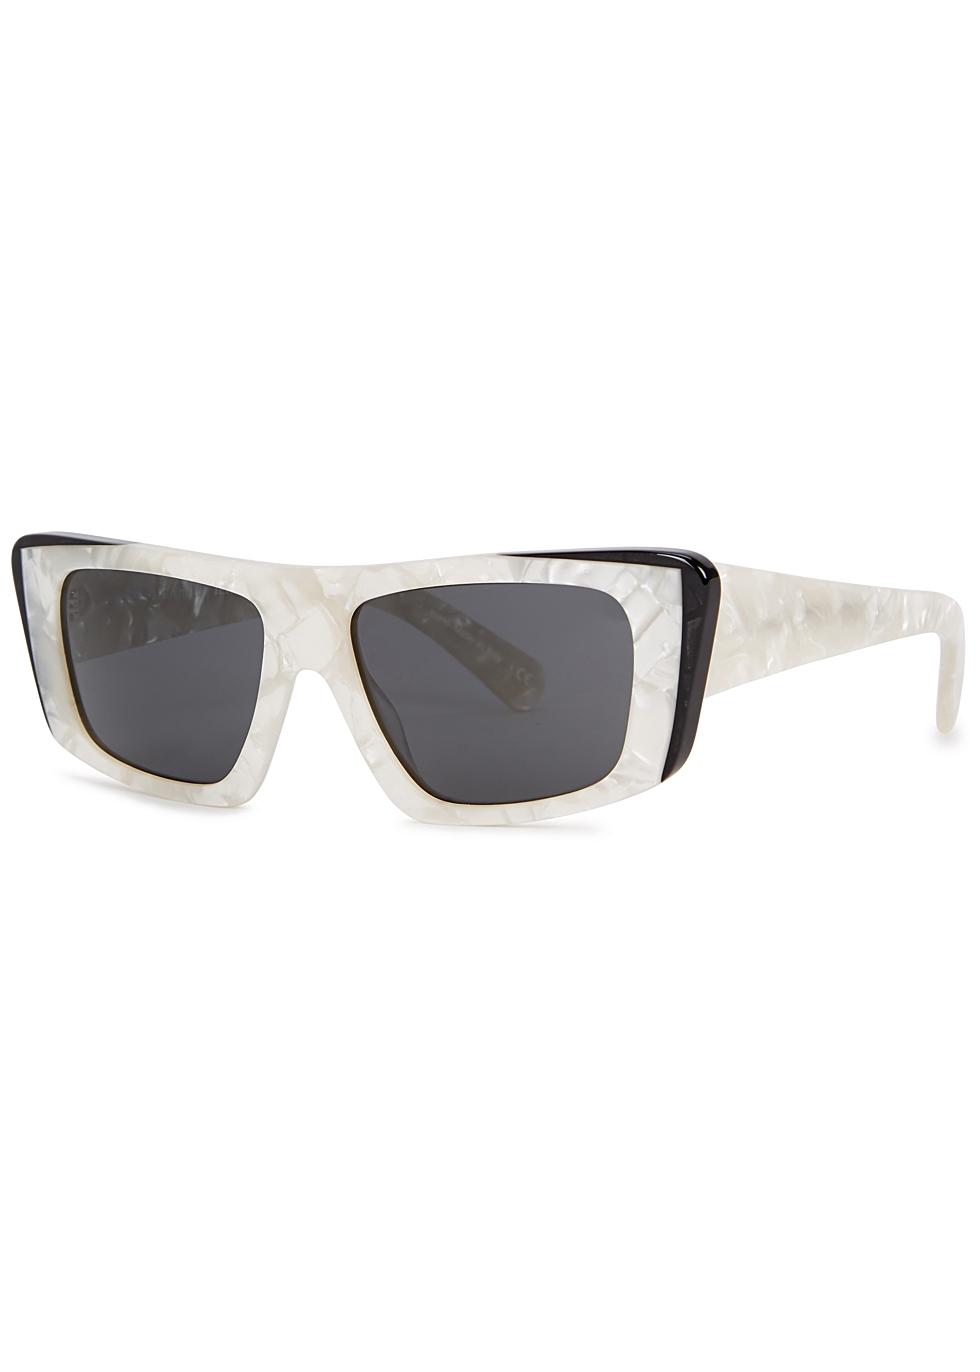 ALAIN MIKLI X Jeremy Scott Rectangle-Frame Sunglasses in Black